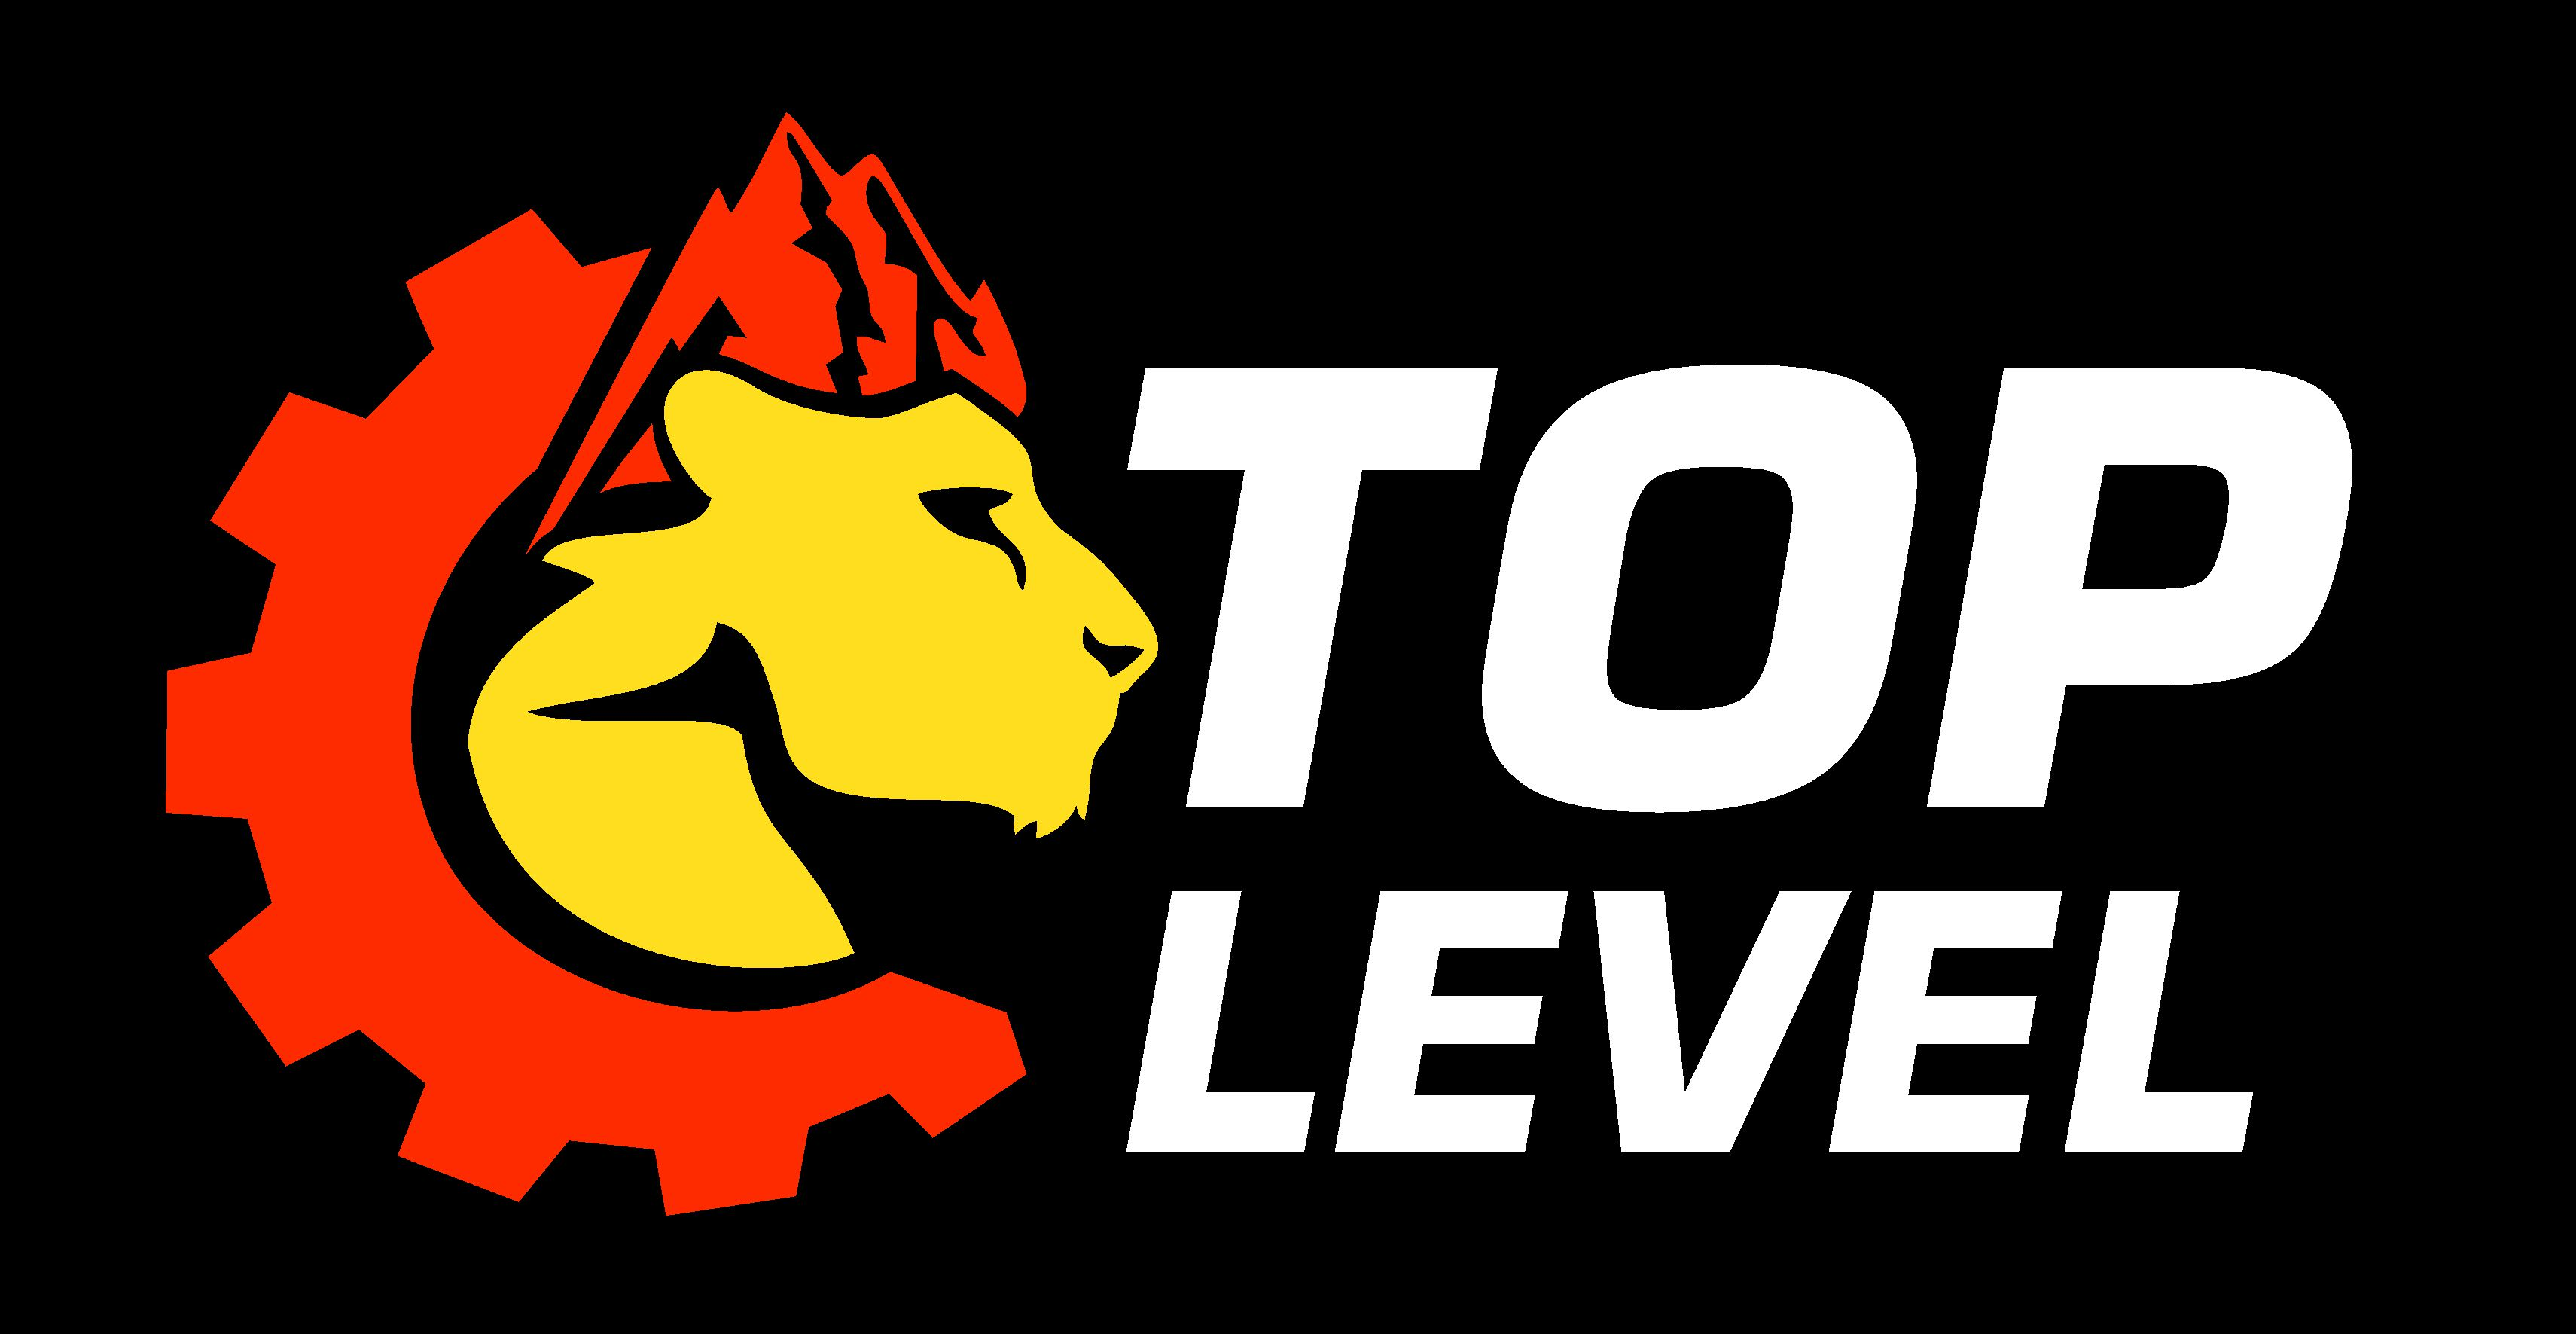 Разработка логотипа для тюнинг ателье фото f_9395f36f2fa05b27.jpg